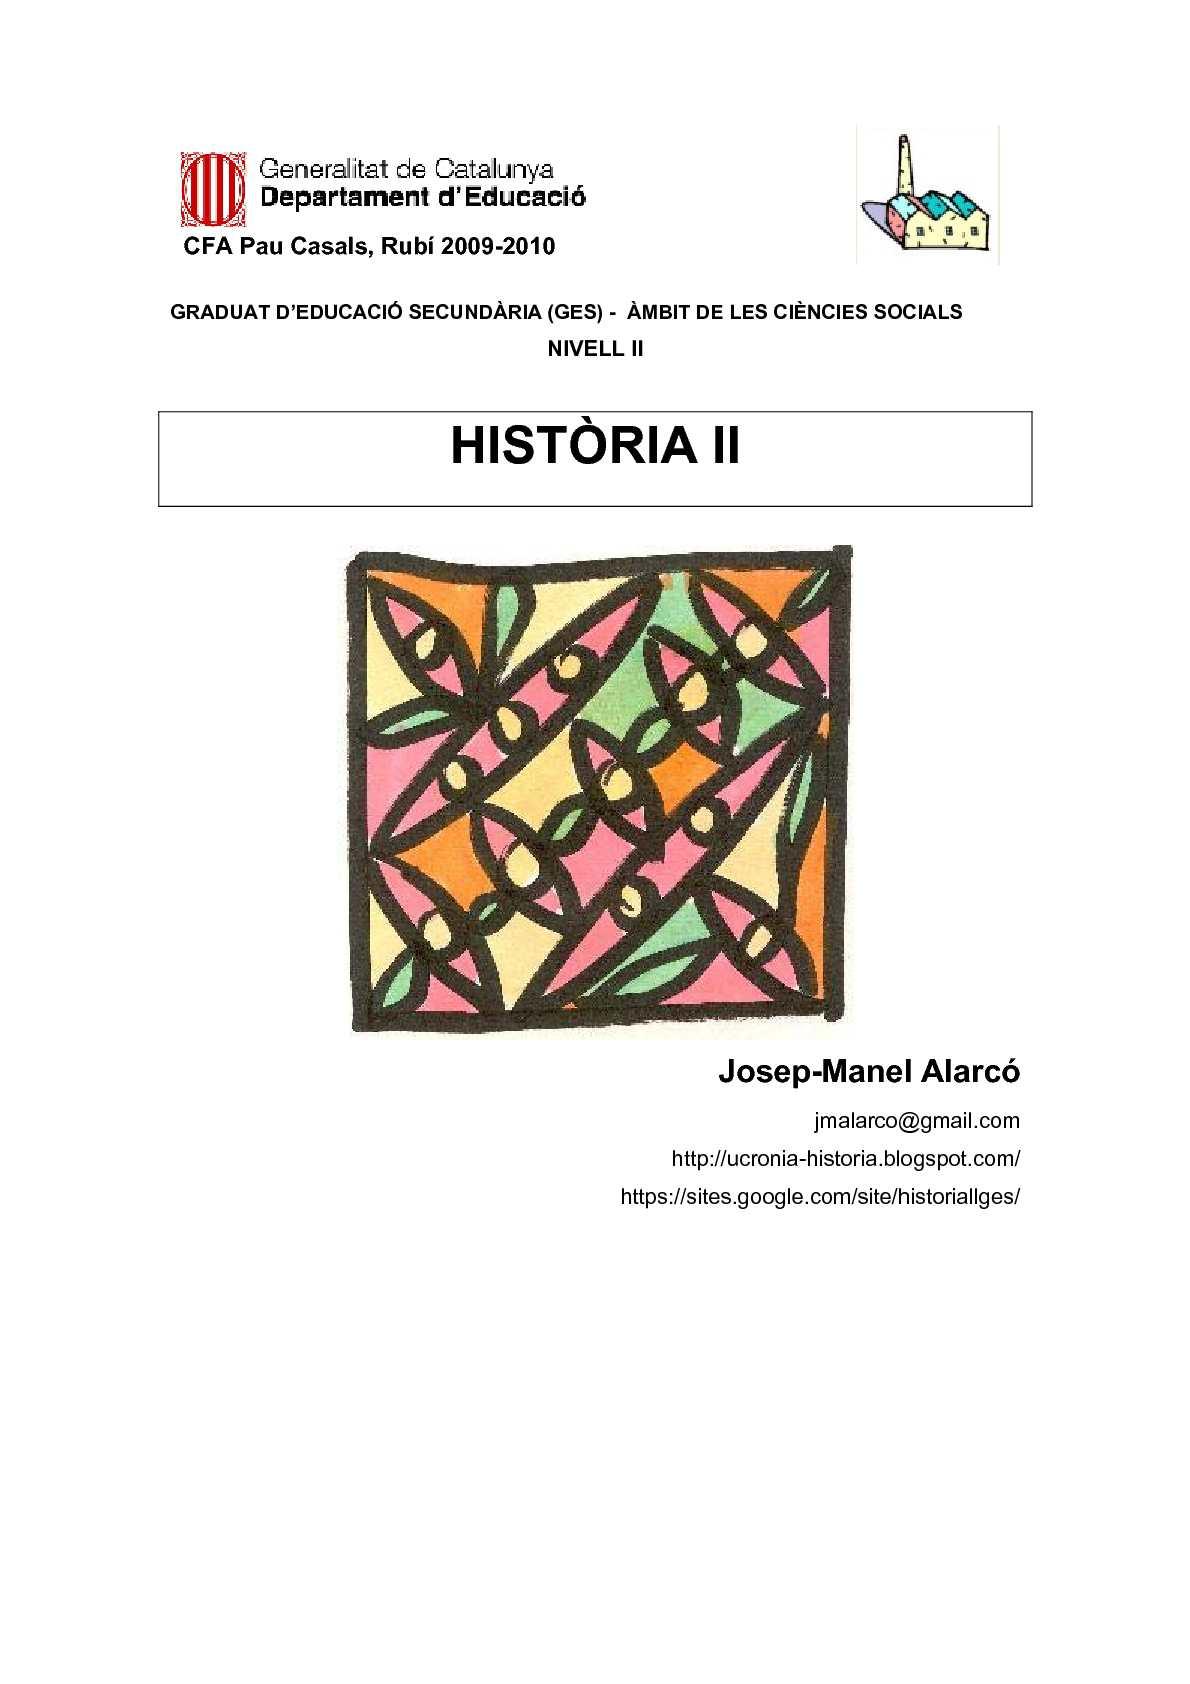 HISTÒRIA II GES II